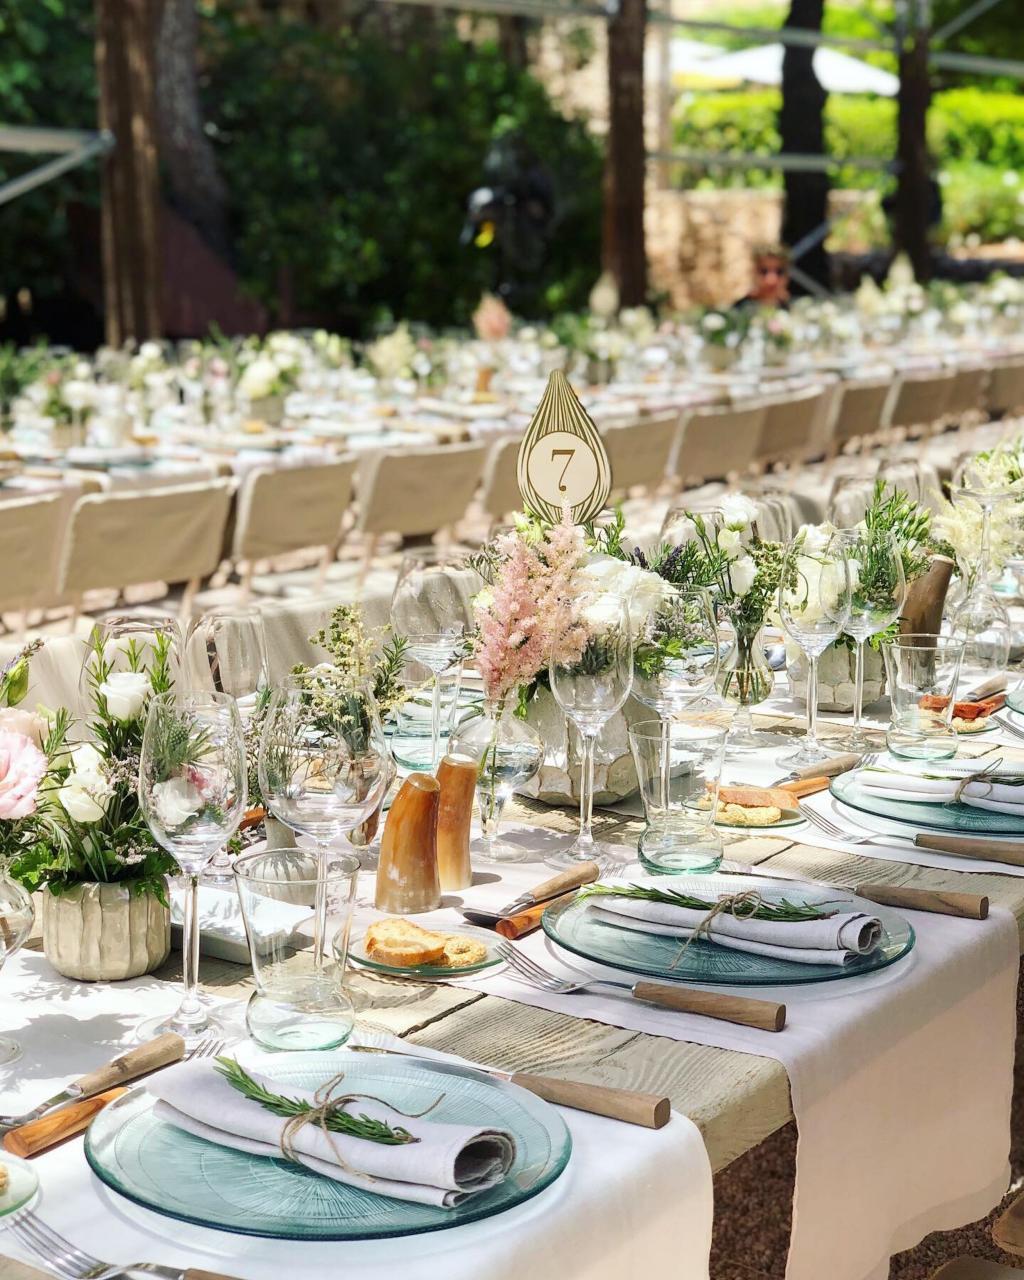 N&M Sinterina wedding - Image 12